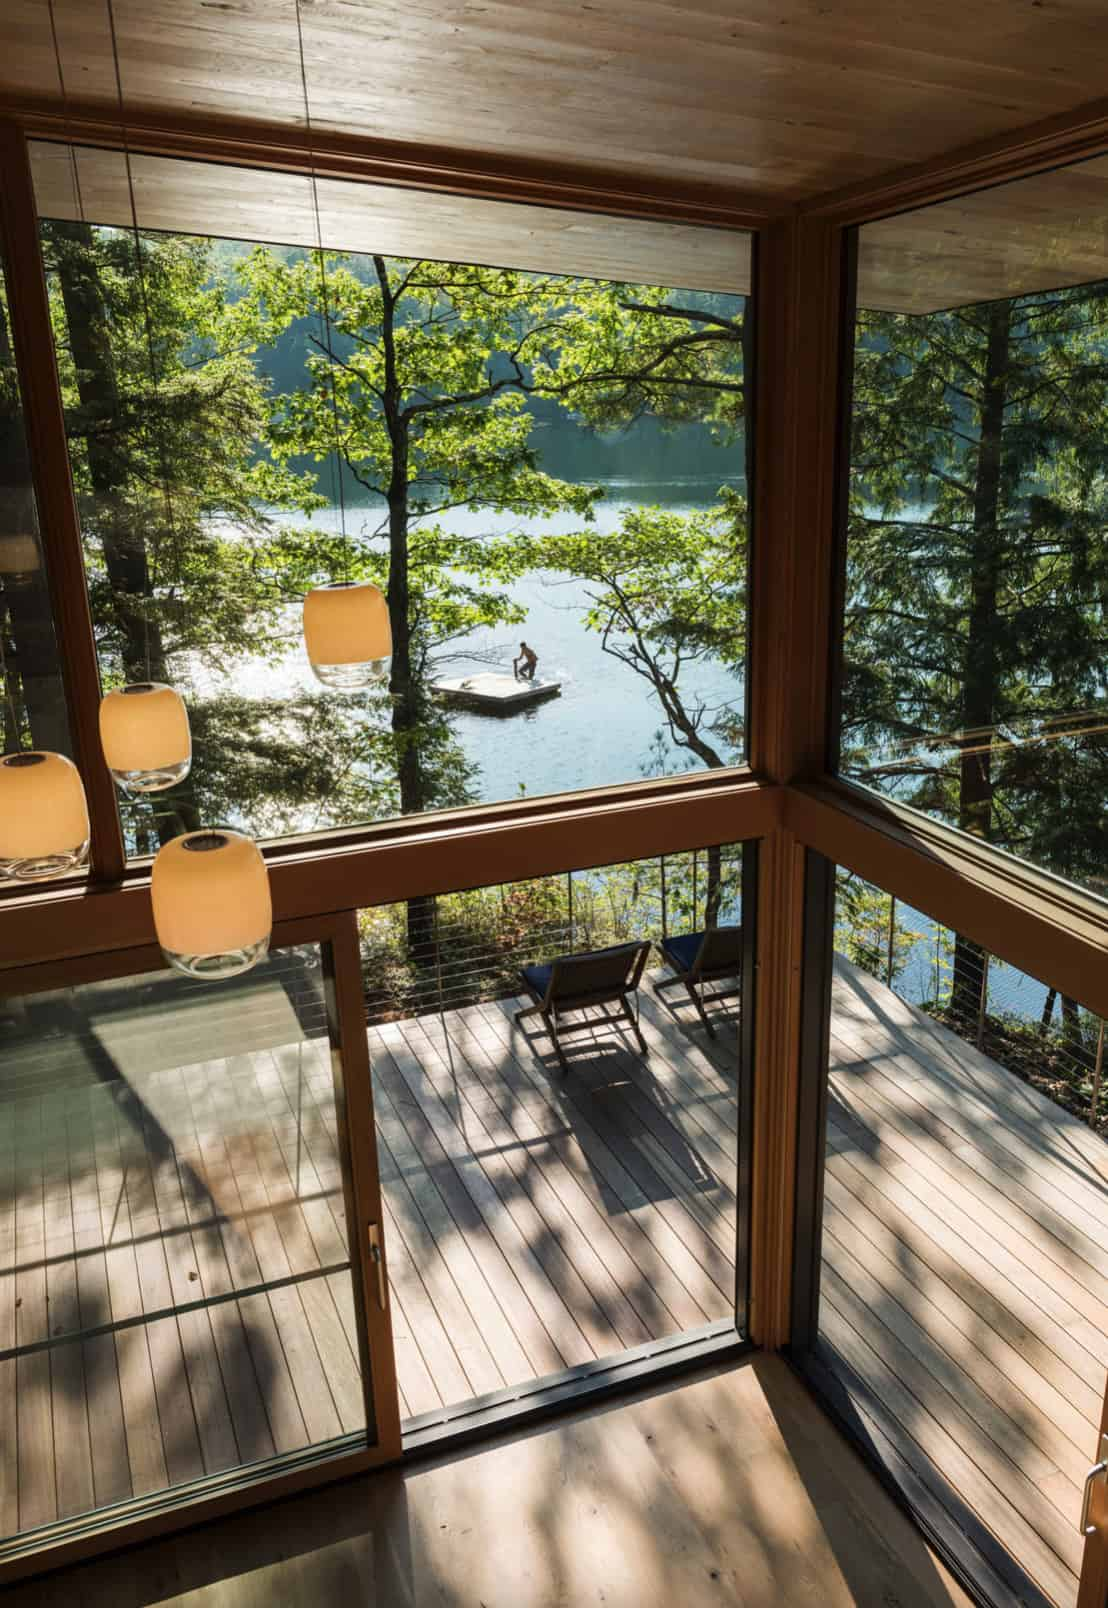 suvremena-dnevna soba-s podom do stropa-staklom s pogledom na jezero